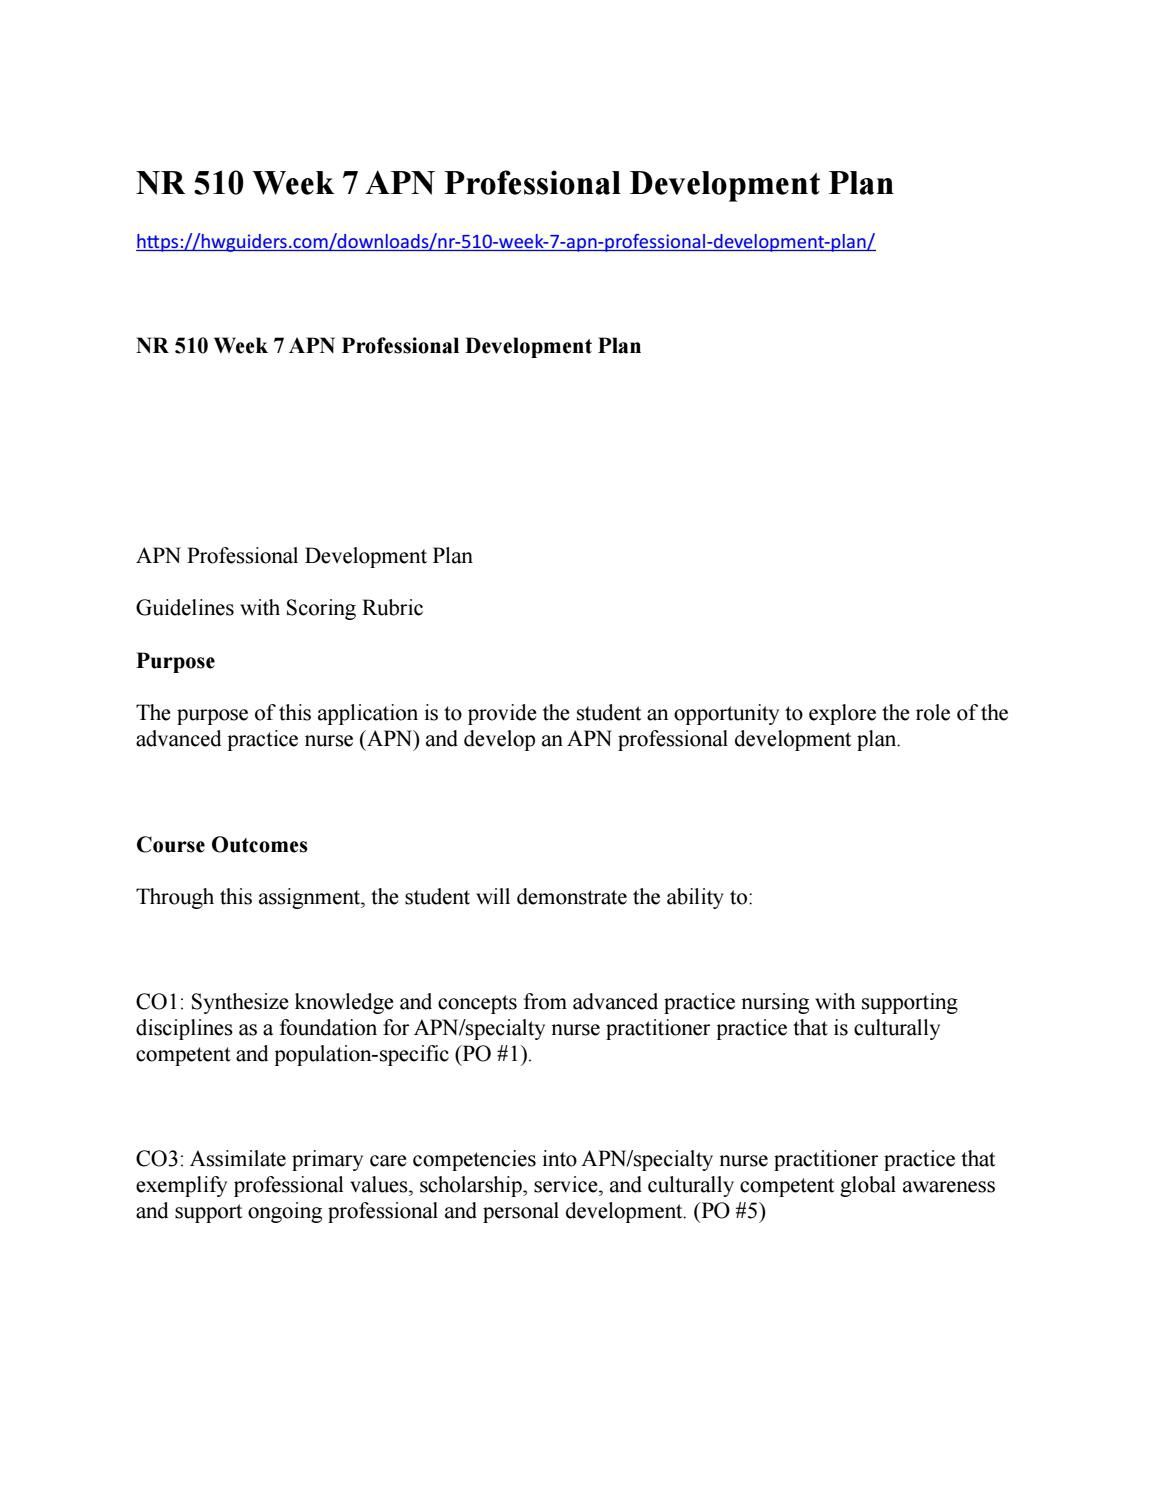 008 Surprising Professional Development Plan Template For Nurse Idea  Nurses Sample Goal ExampleFull